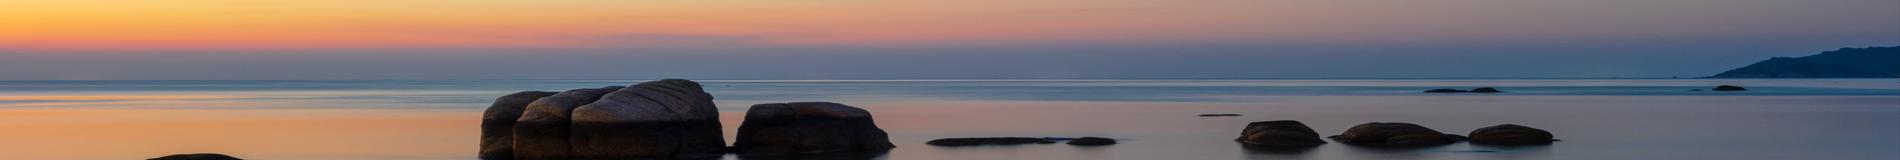 Mindfulness Meditation for TC Wellness